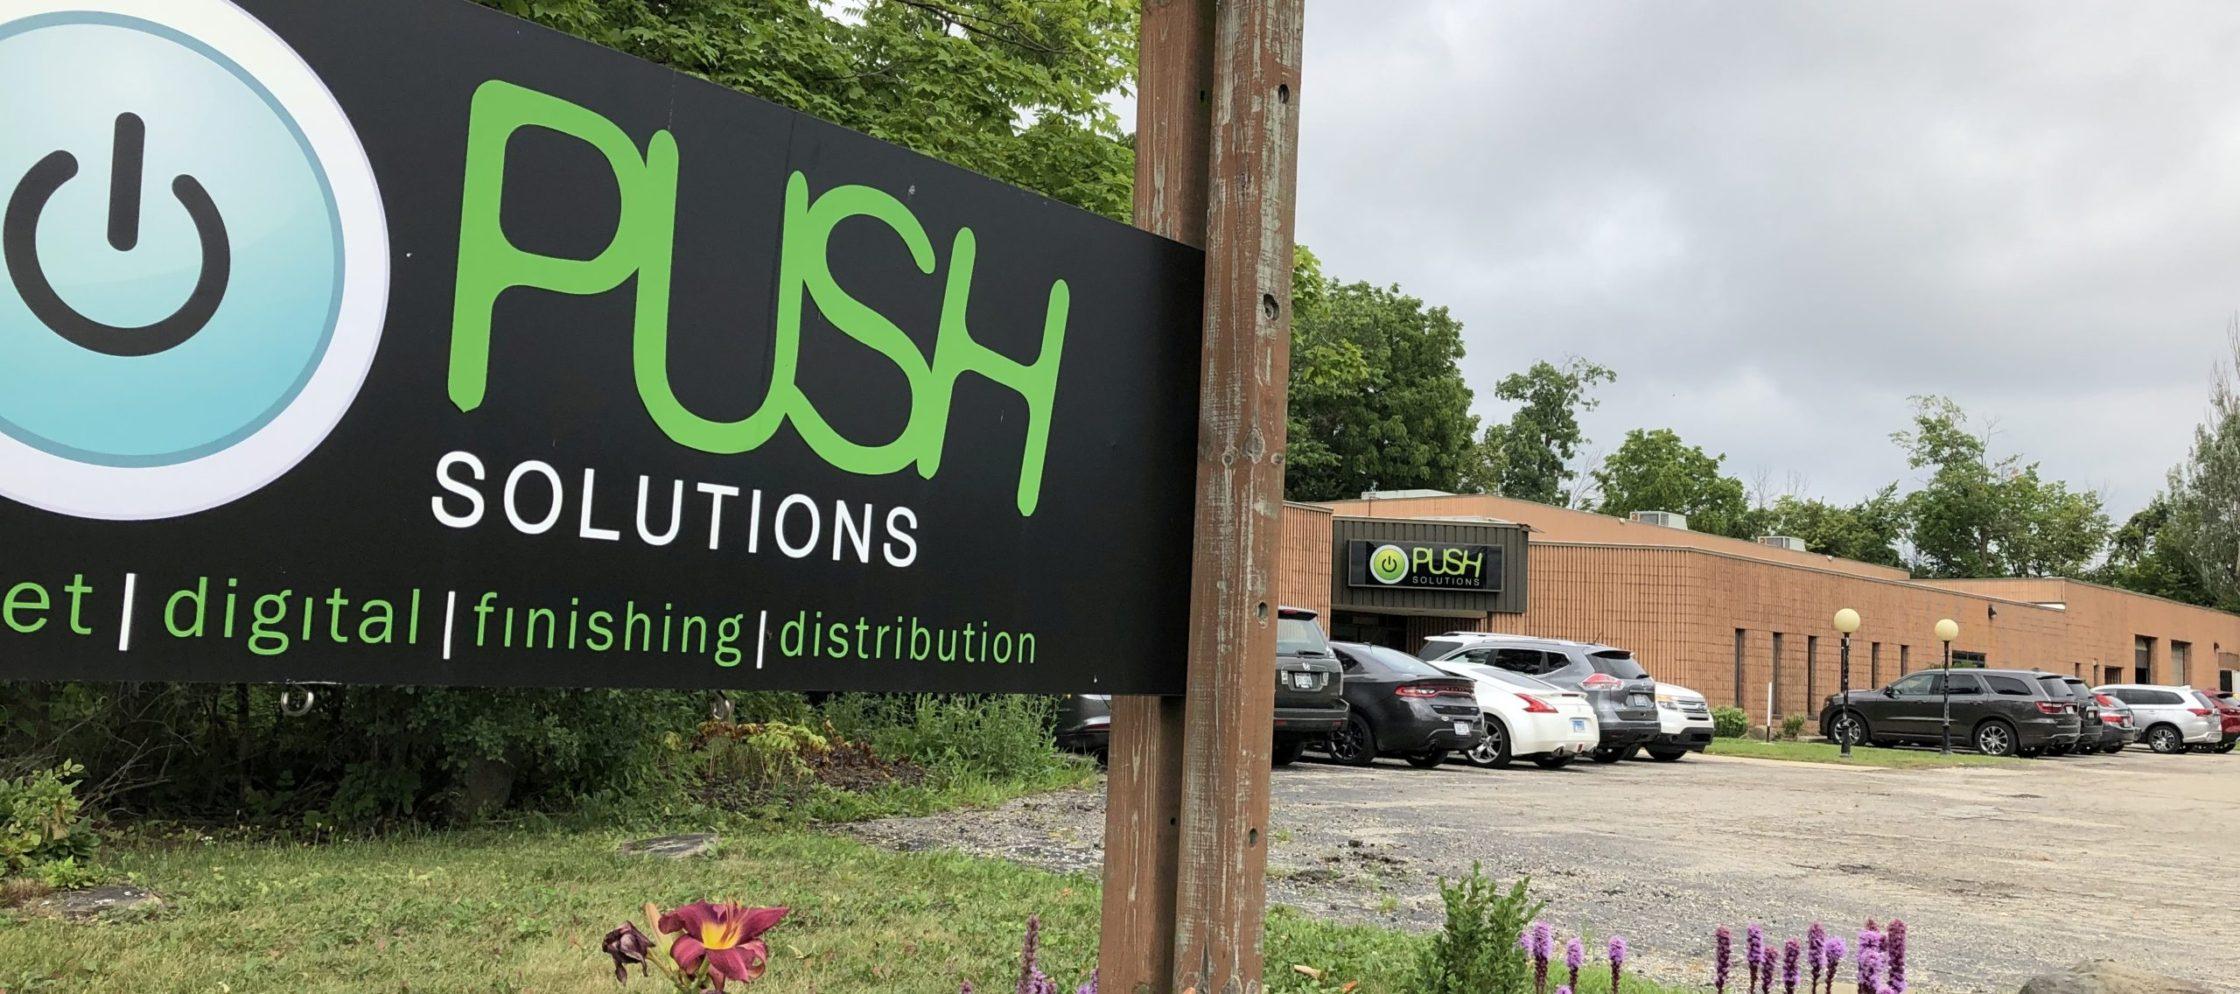 Push Solutions_Exterior